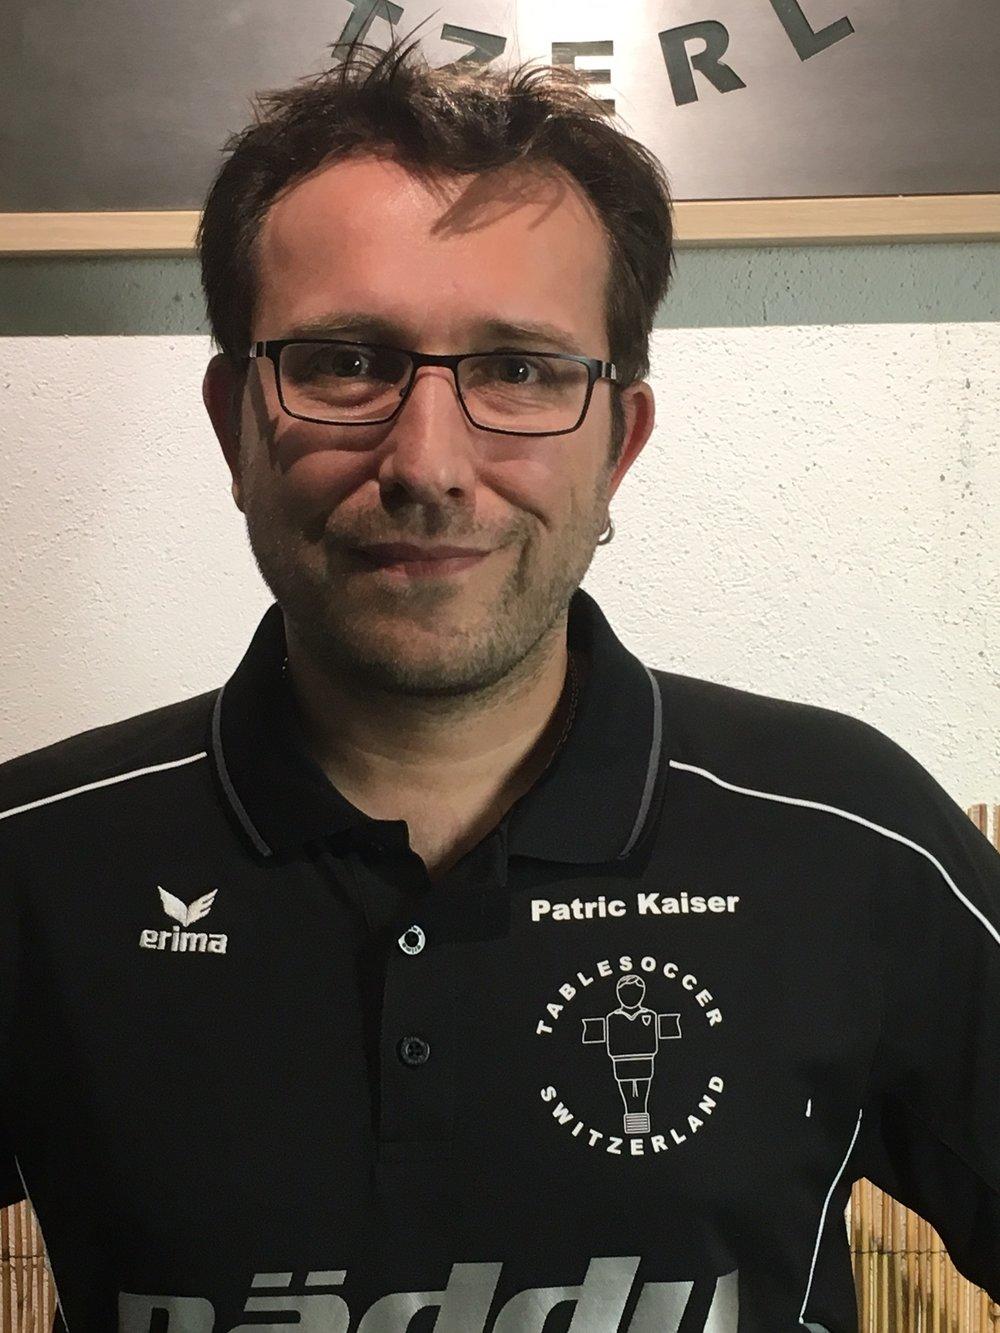 Patric Kaiser, SG